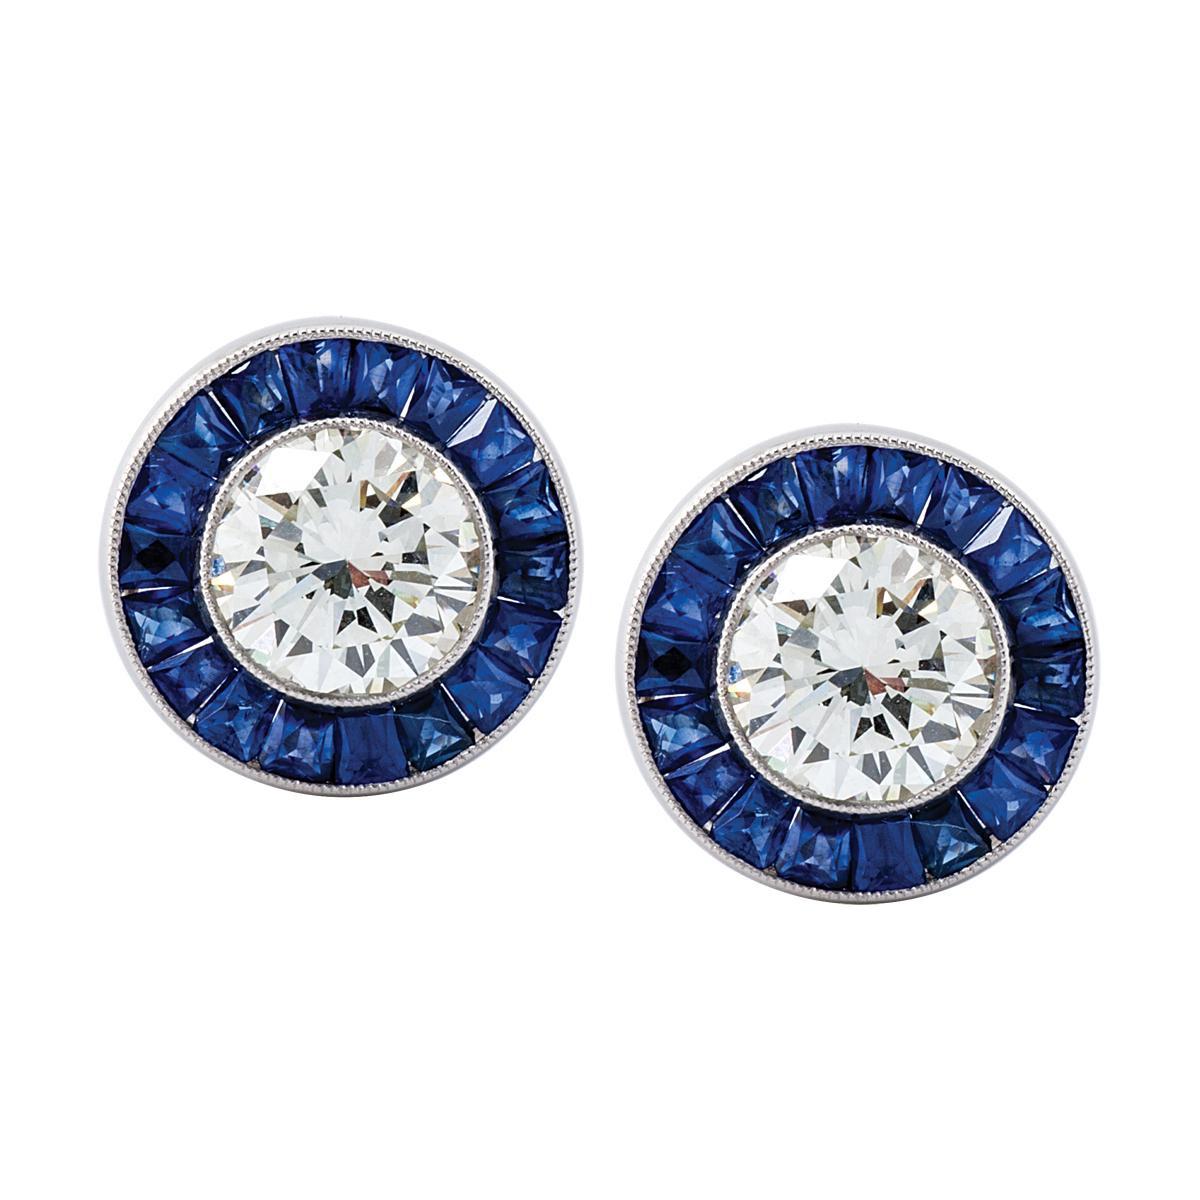 Vintage Platinum Earrings with 3.00 CTW Diamonds & 1.18 CTW Sapphires